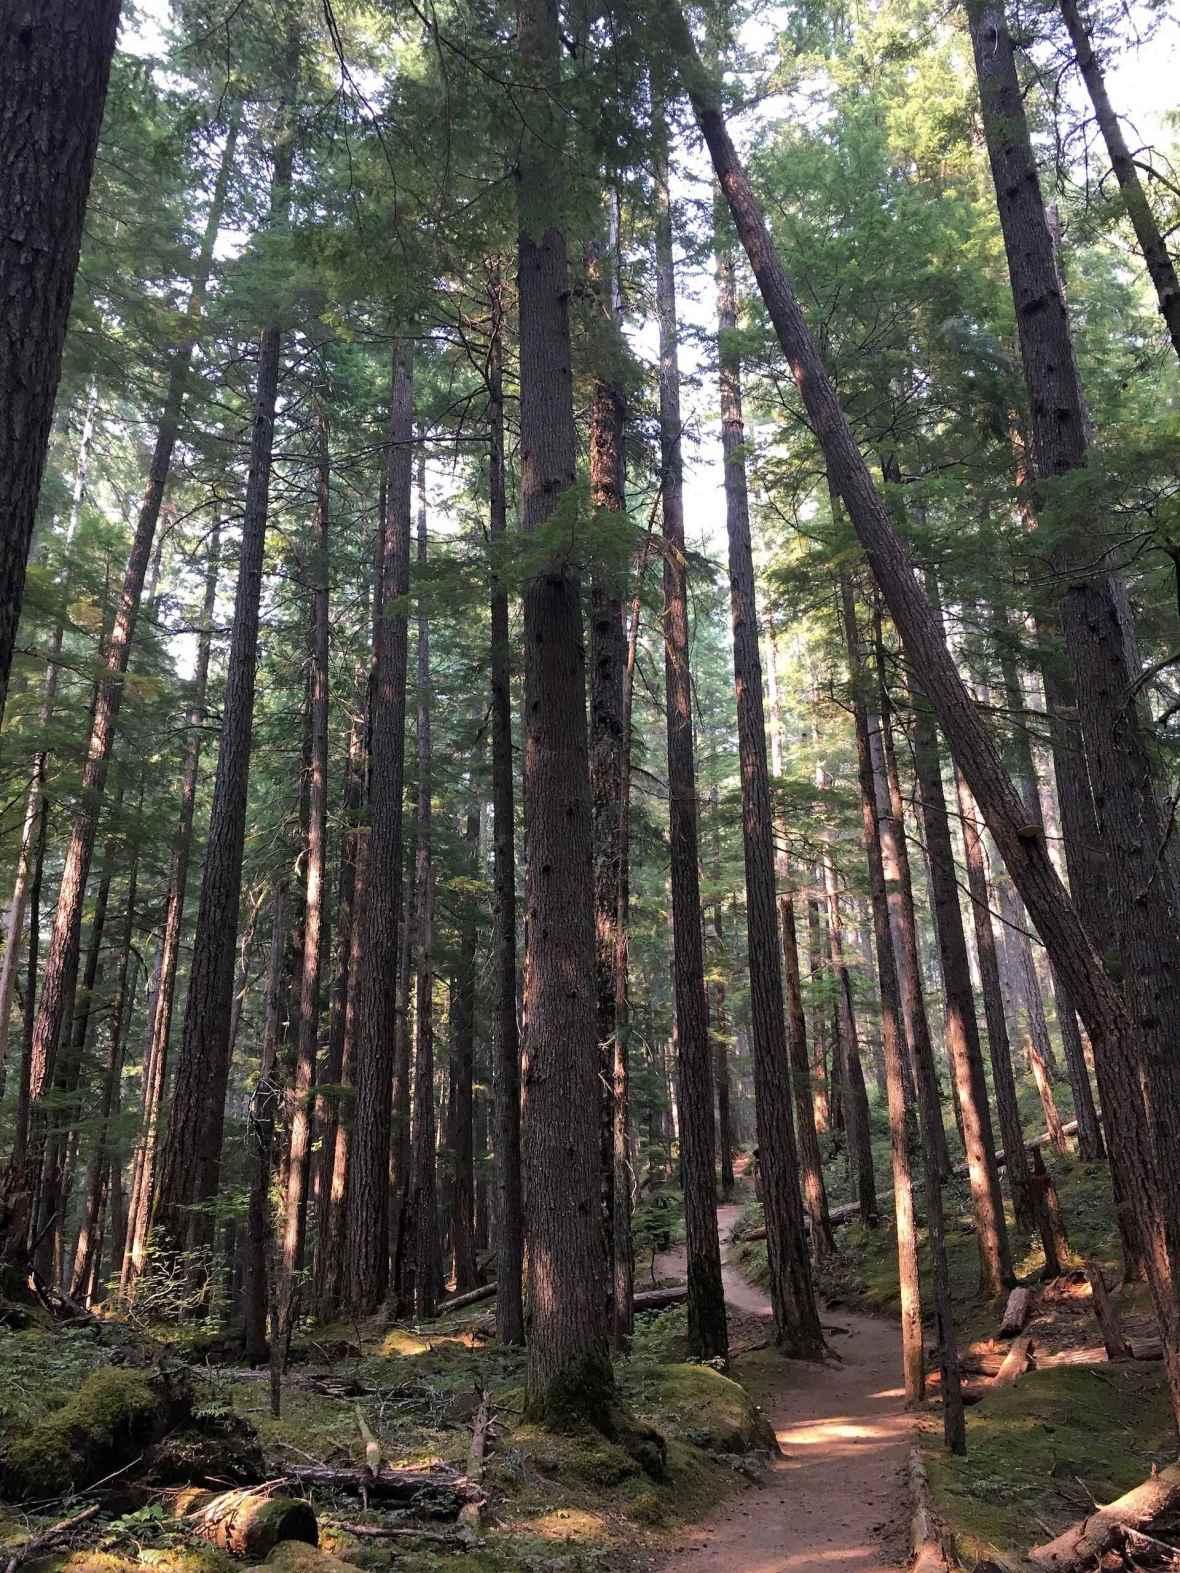 Walking under the tall trees on the Silver Falls trail Ohanapecosh Mt Ranier National Park